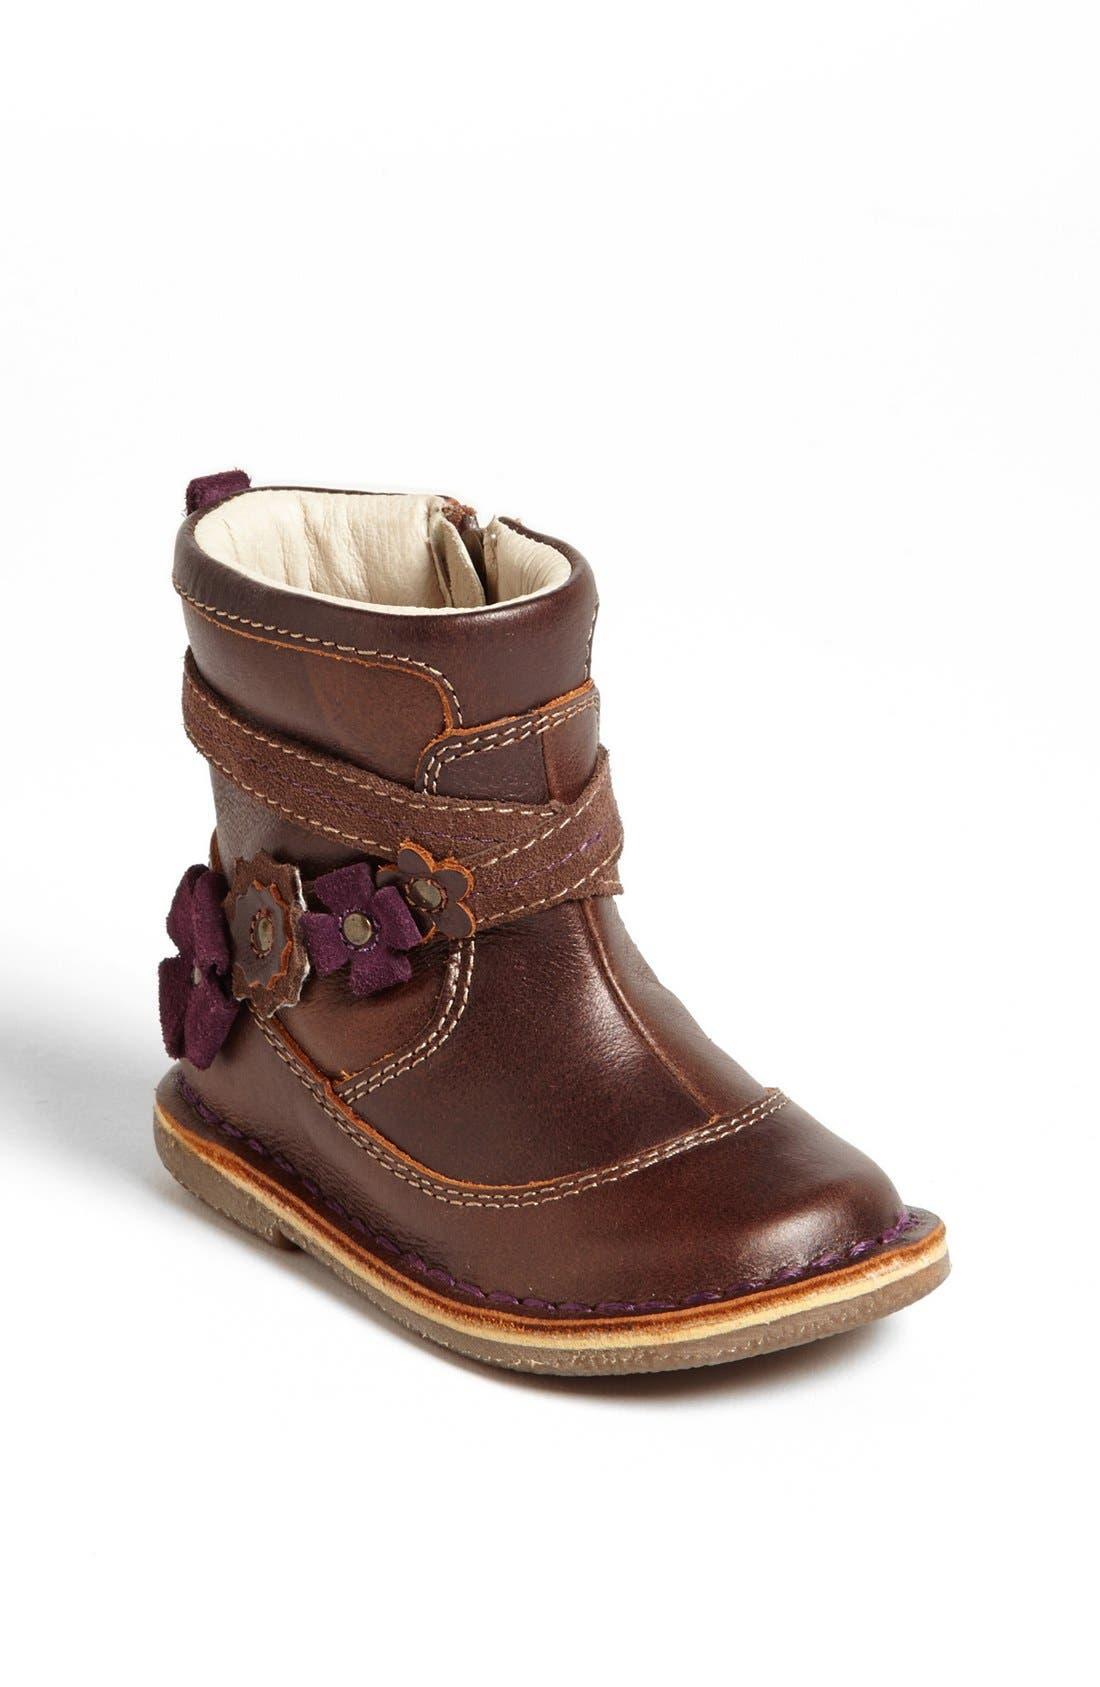 Main Image - Stride Rite 'Medallion Collection - Roslin' Boot (Baby, Walker & Toddler)